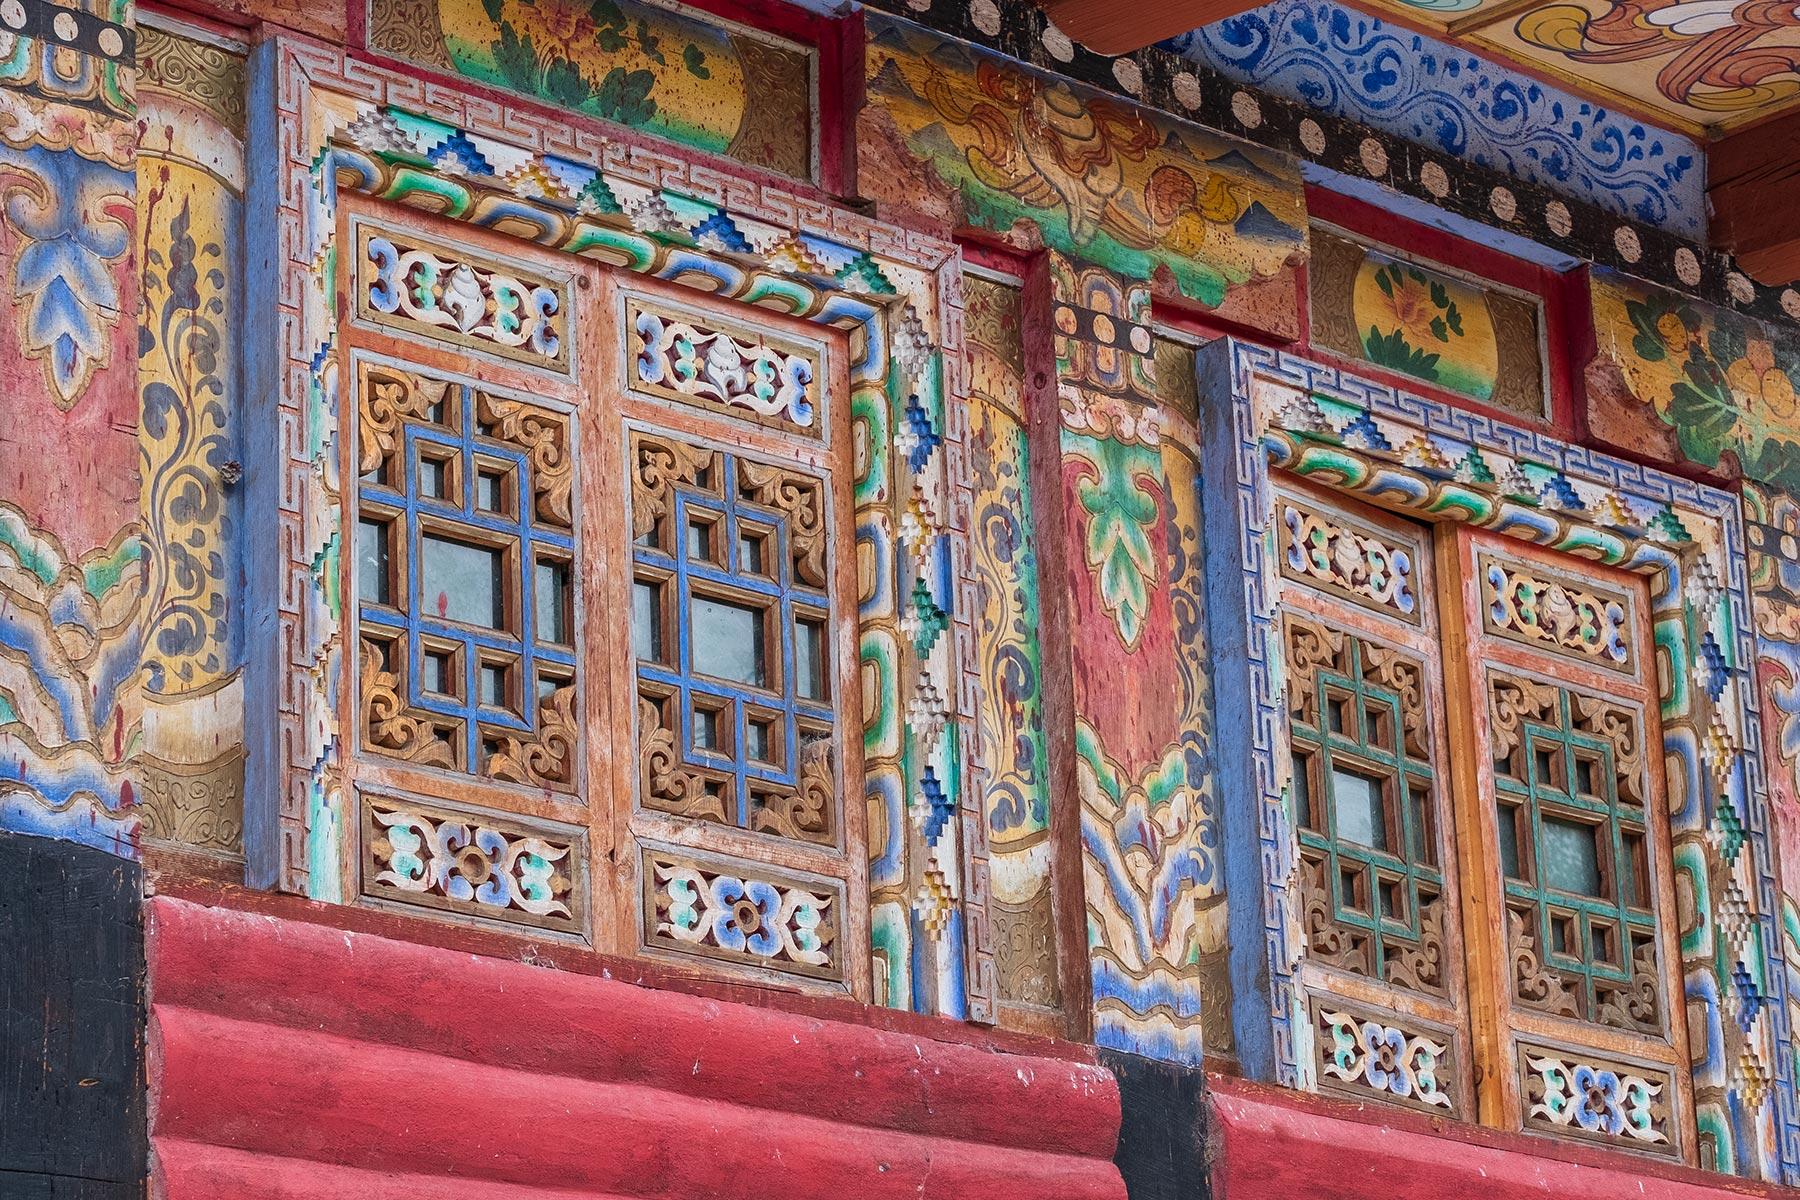 Holzverzierung Malerei in tibetischen Dorf Danba Zangzhai in China